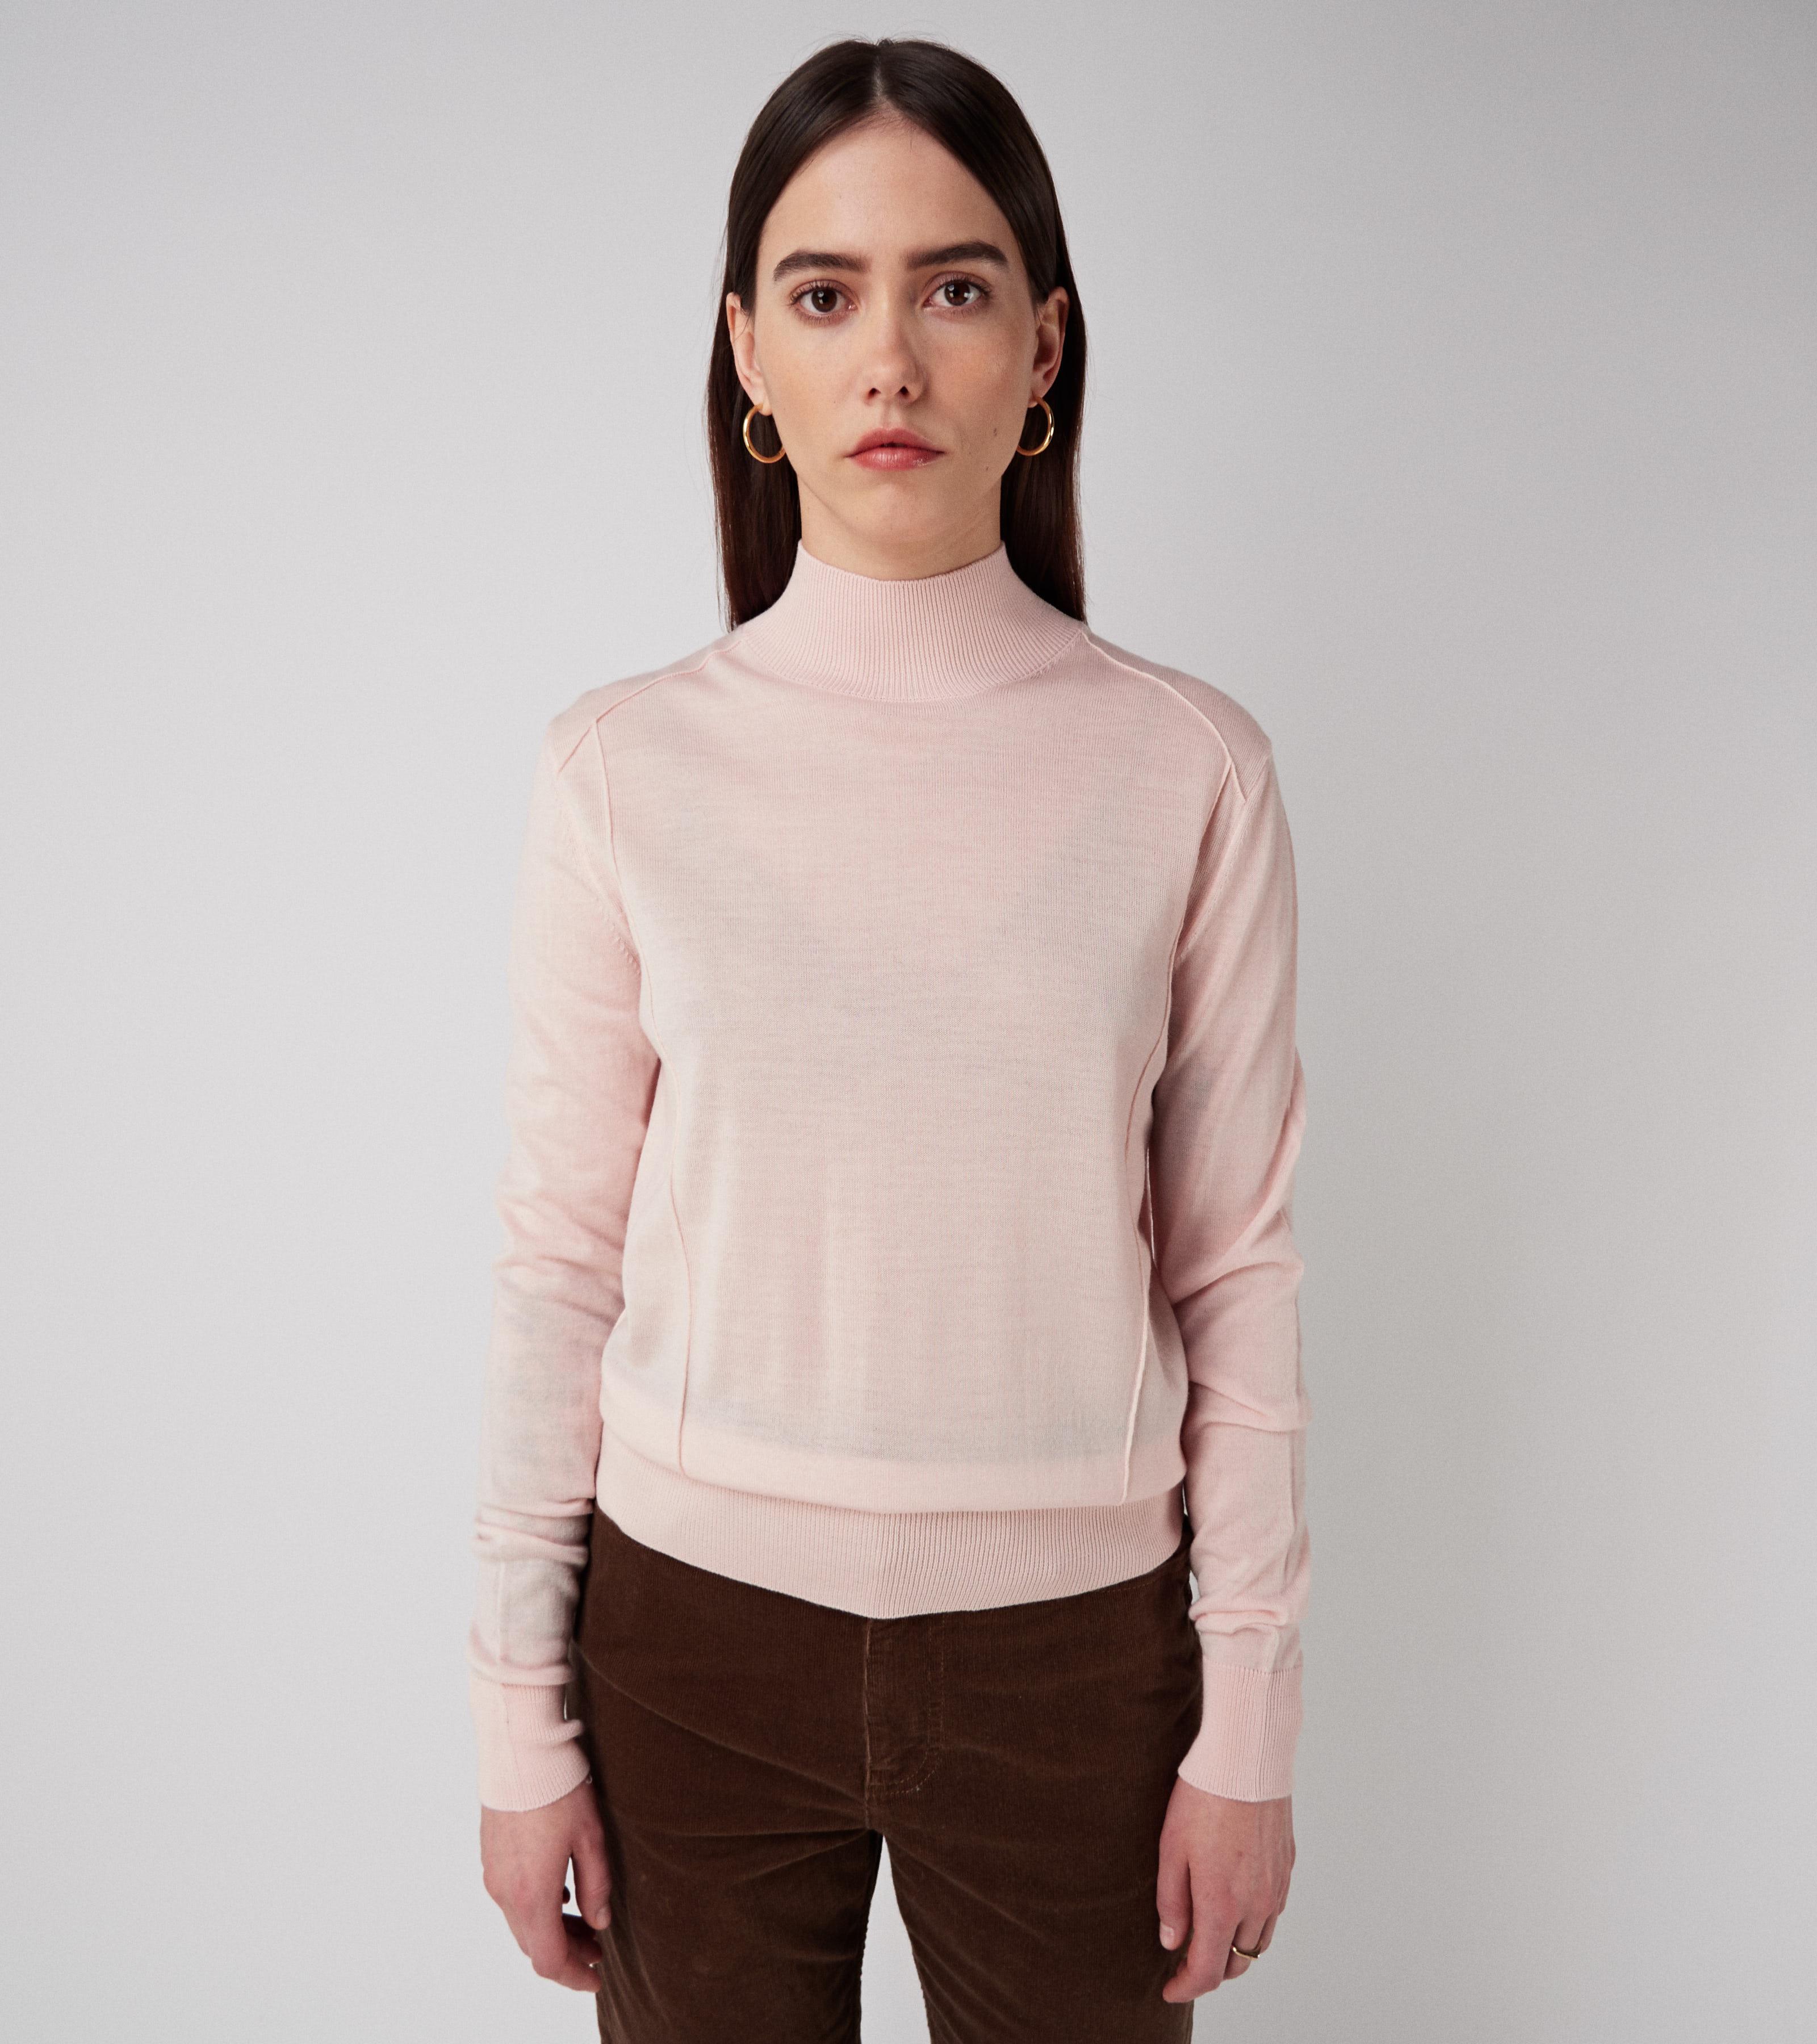 Nova Sweater Light Pink